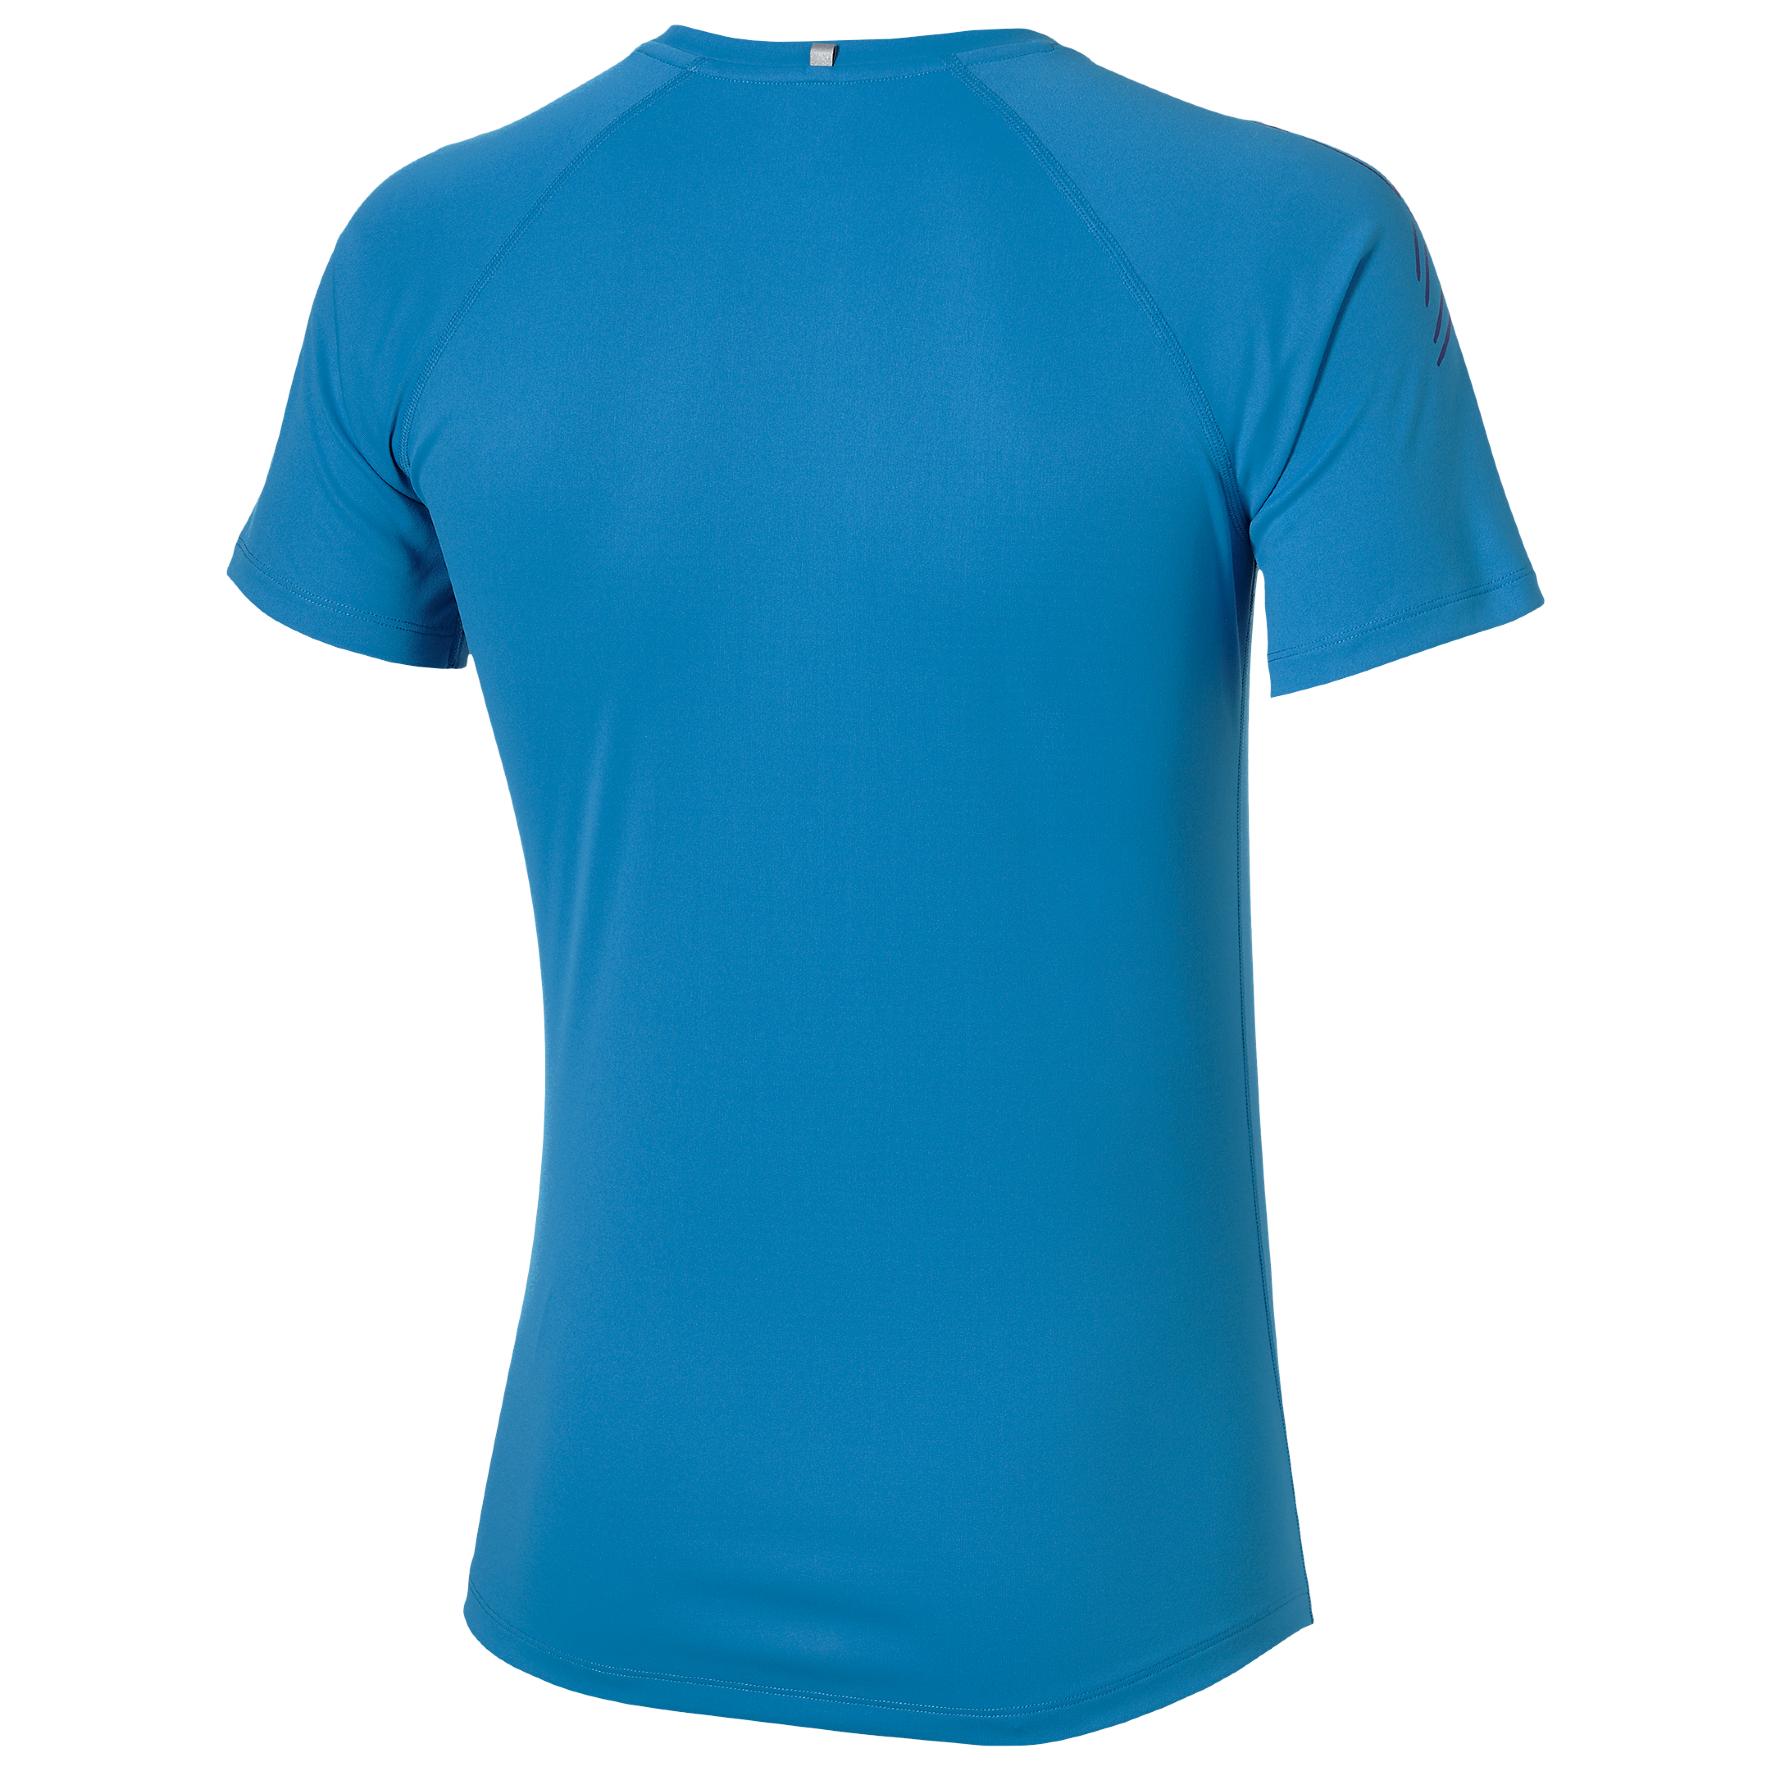 Мужская беговая одежда Asics Stripe SS (126236 0823) голубая